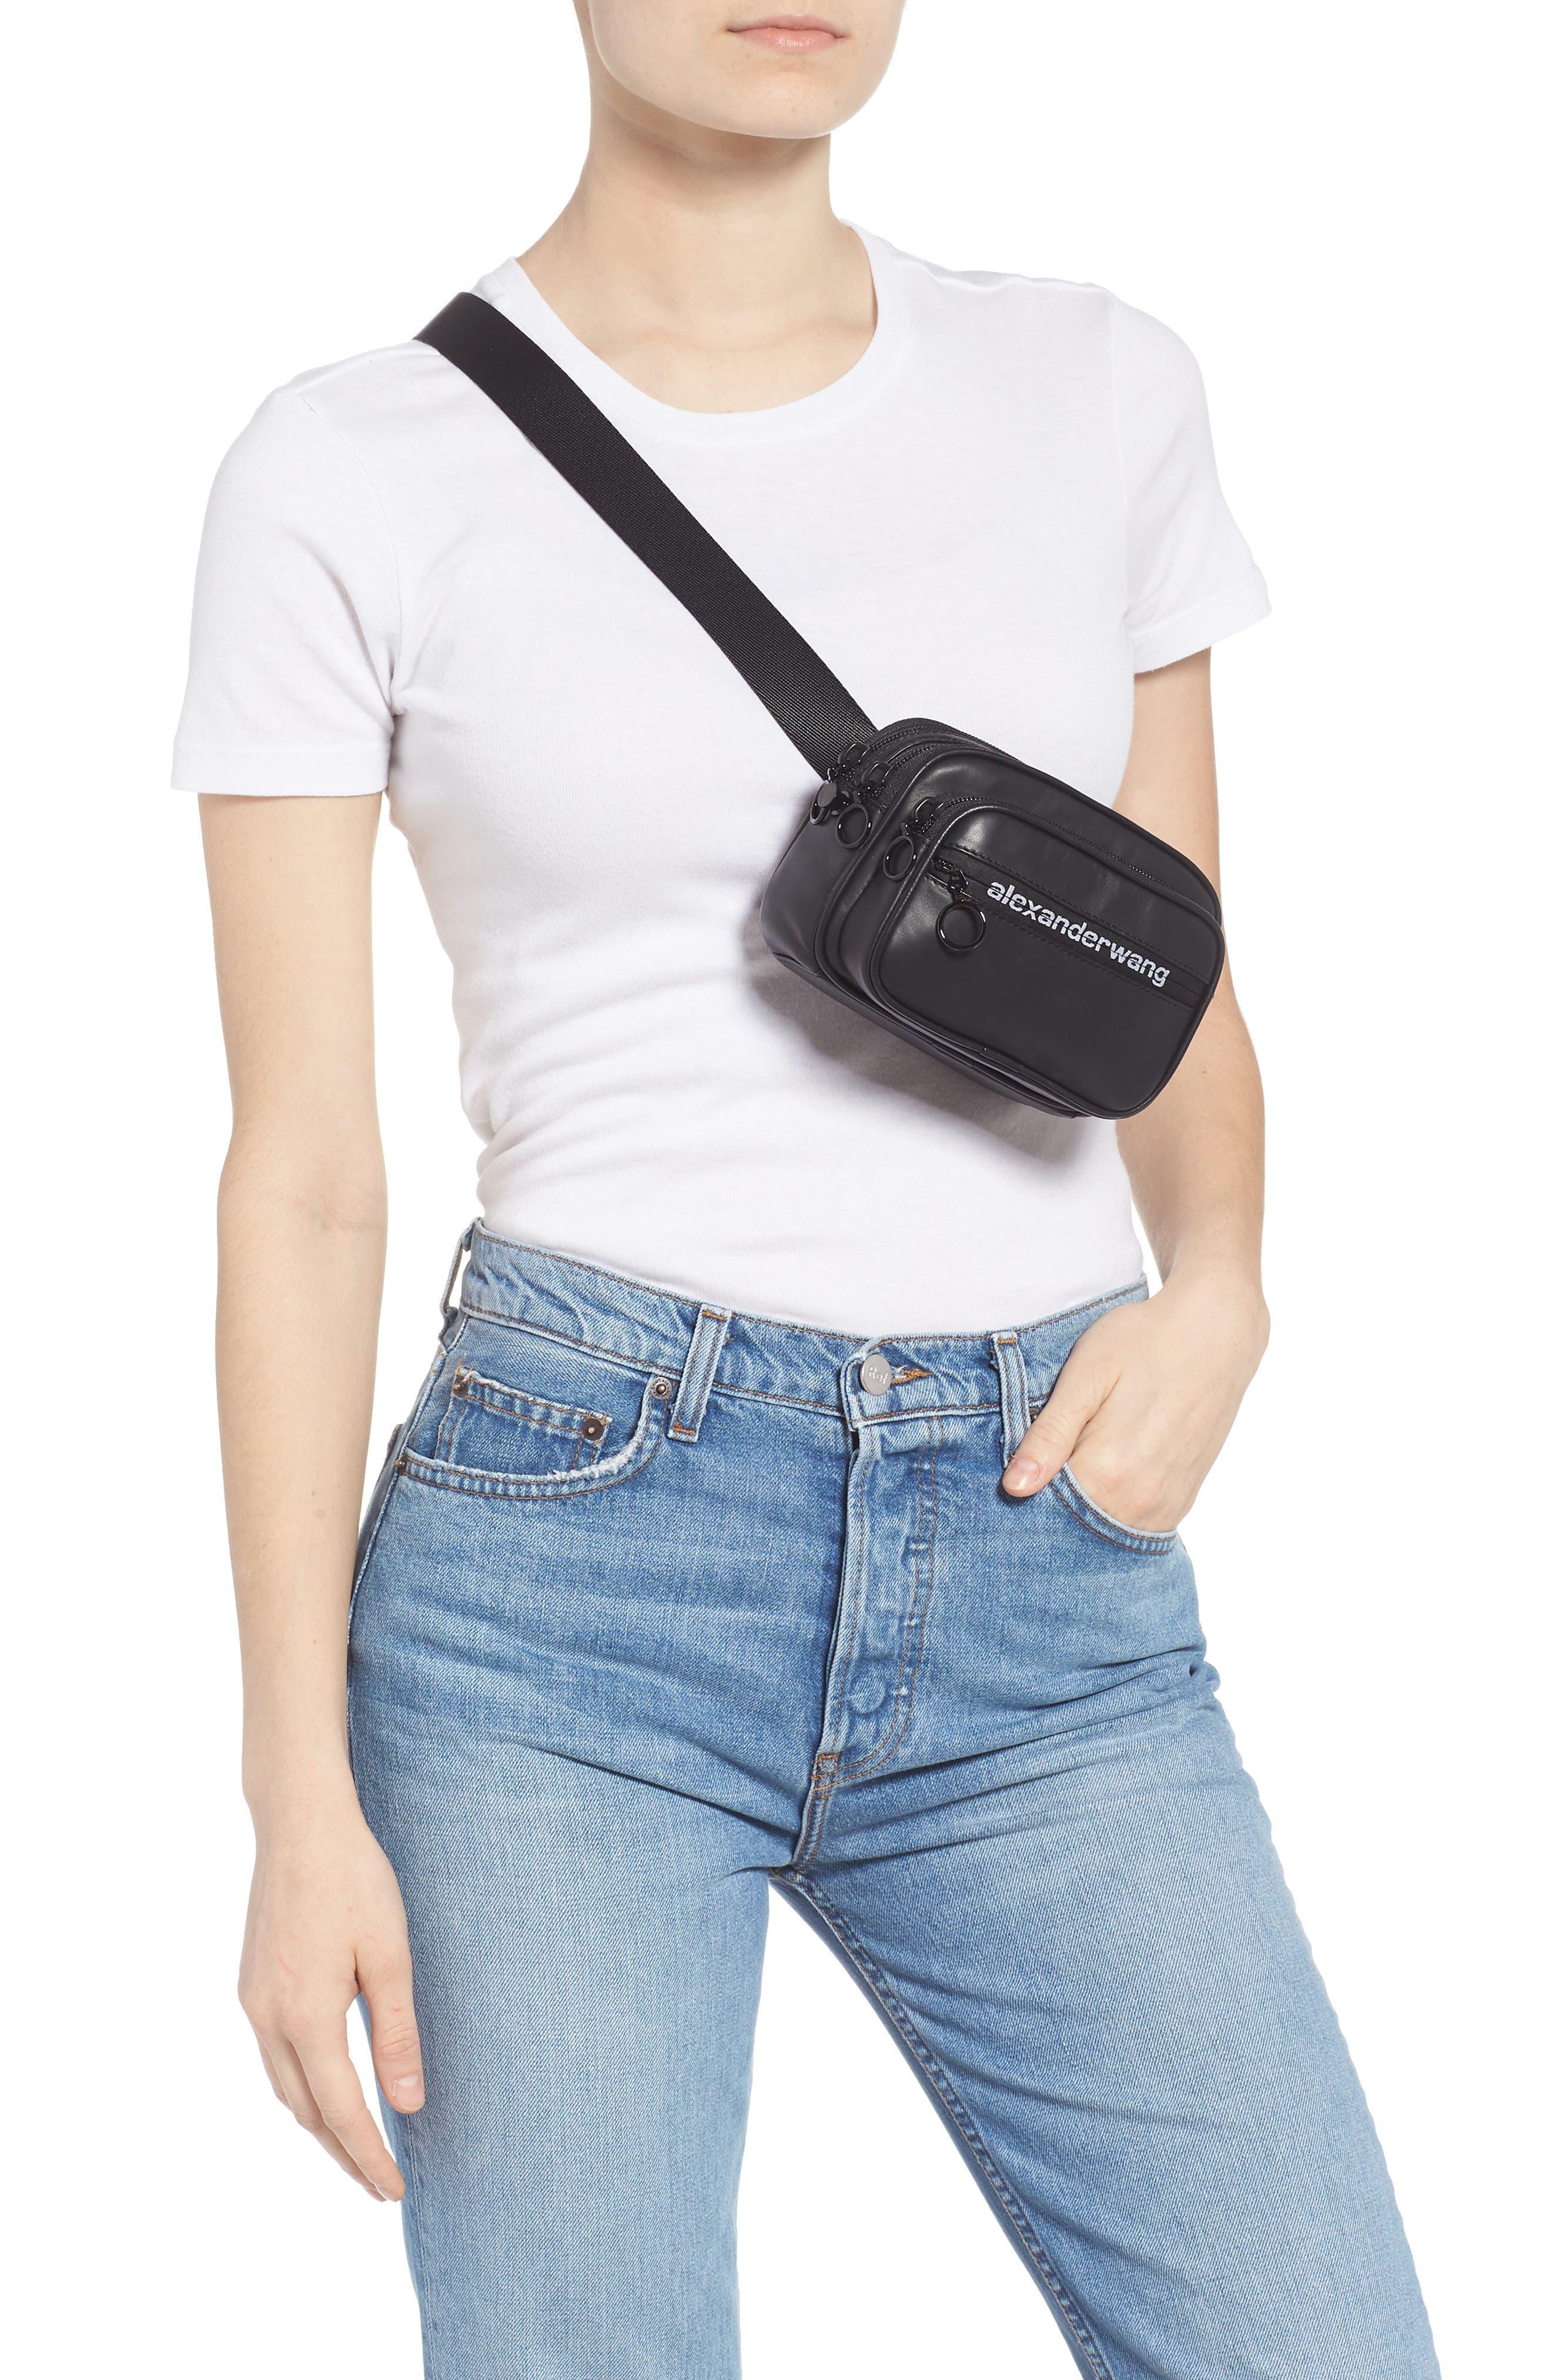 ALEXANDER WANG, Attica Logo Leather Belt Bag, Alternate thumbnail 3, color, BLACK